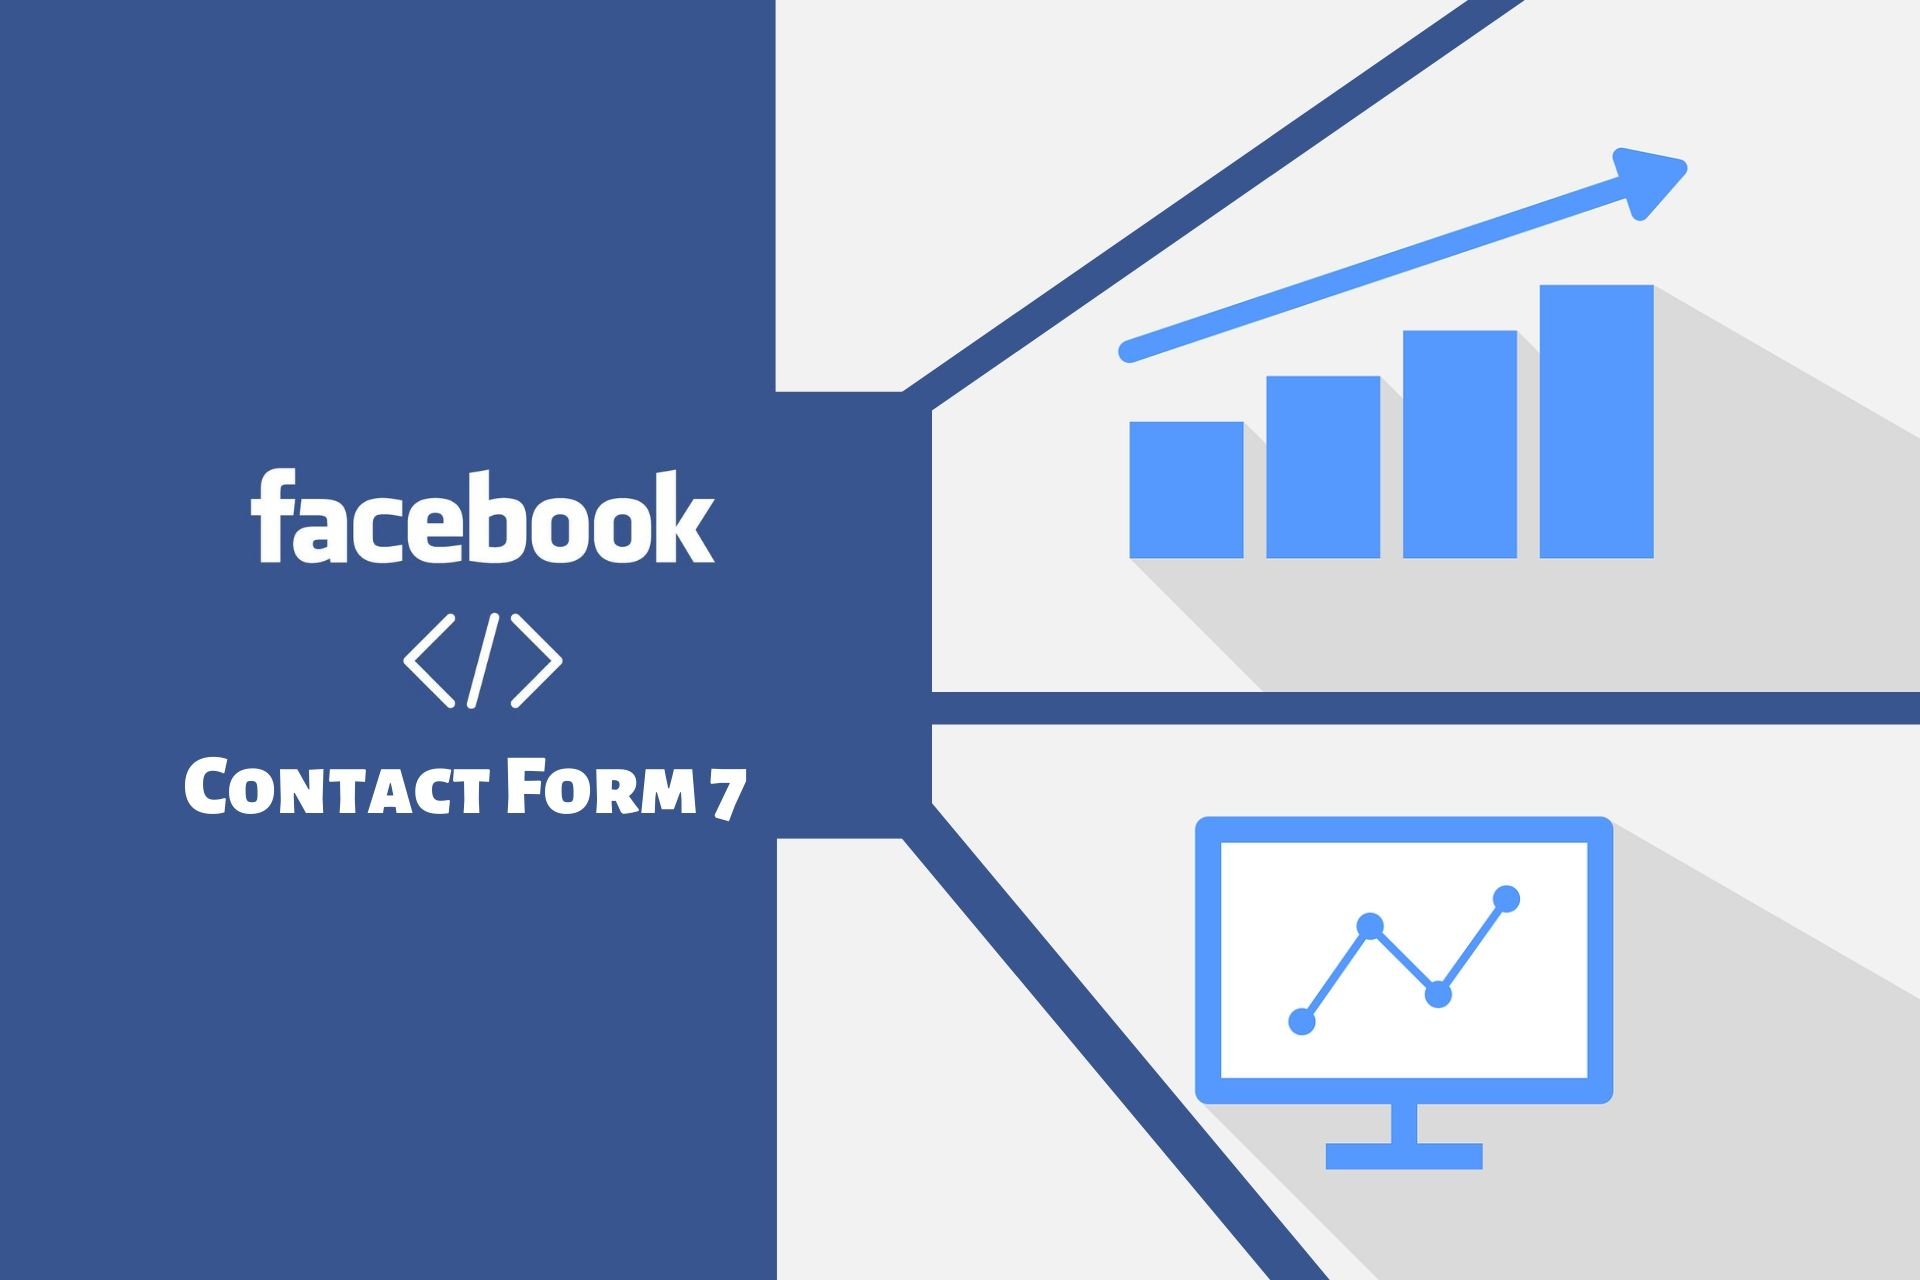 facebok pixel & contact form 7